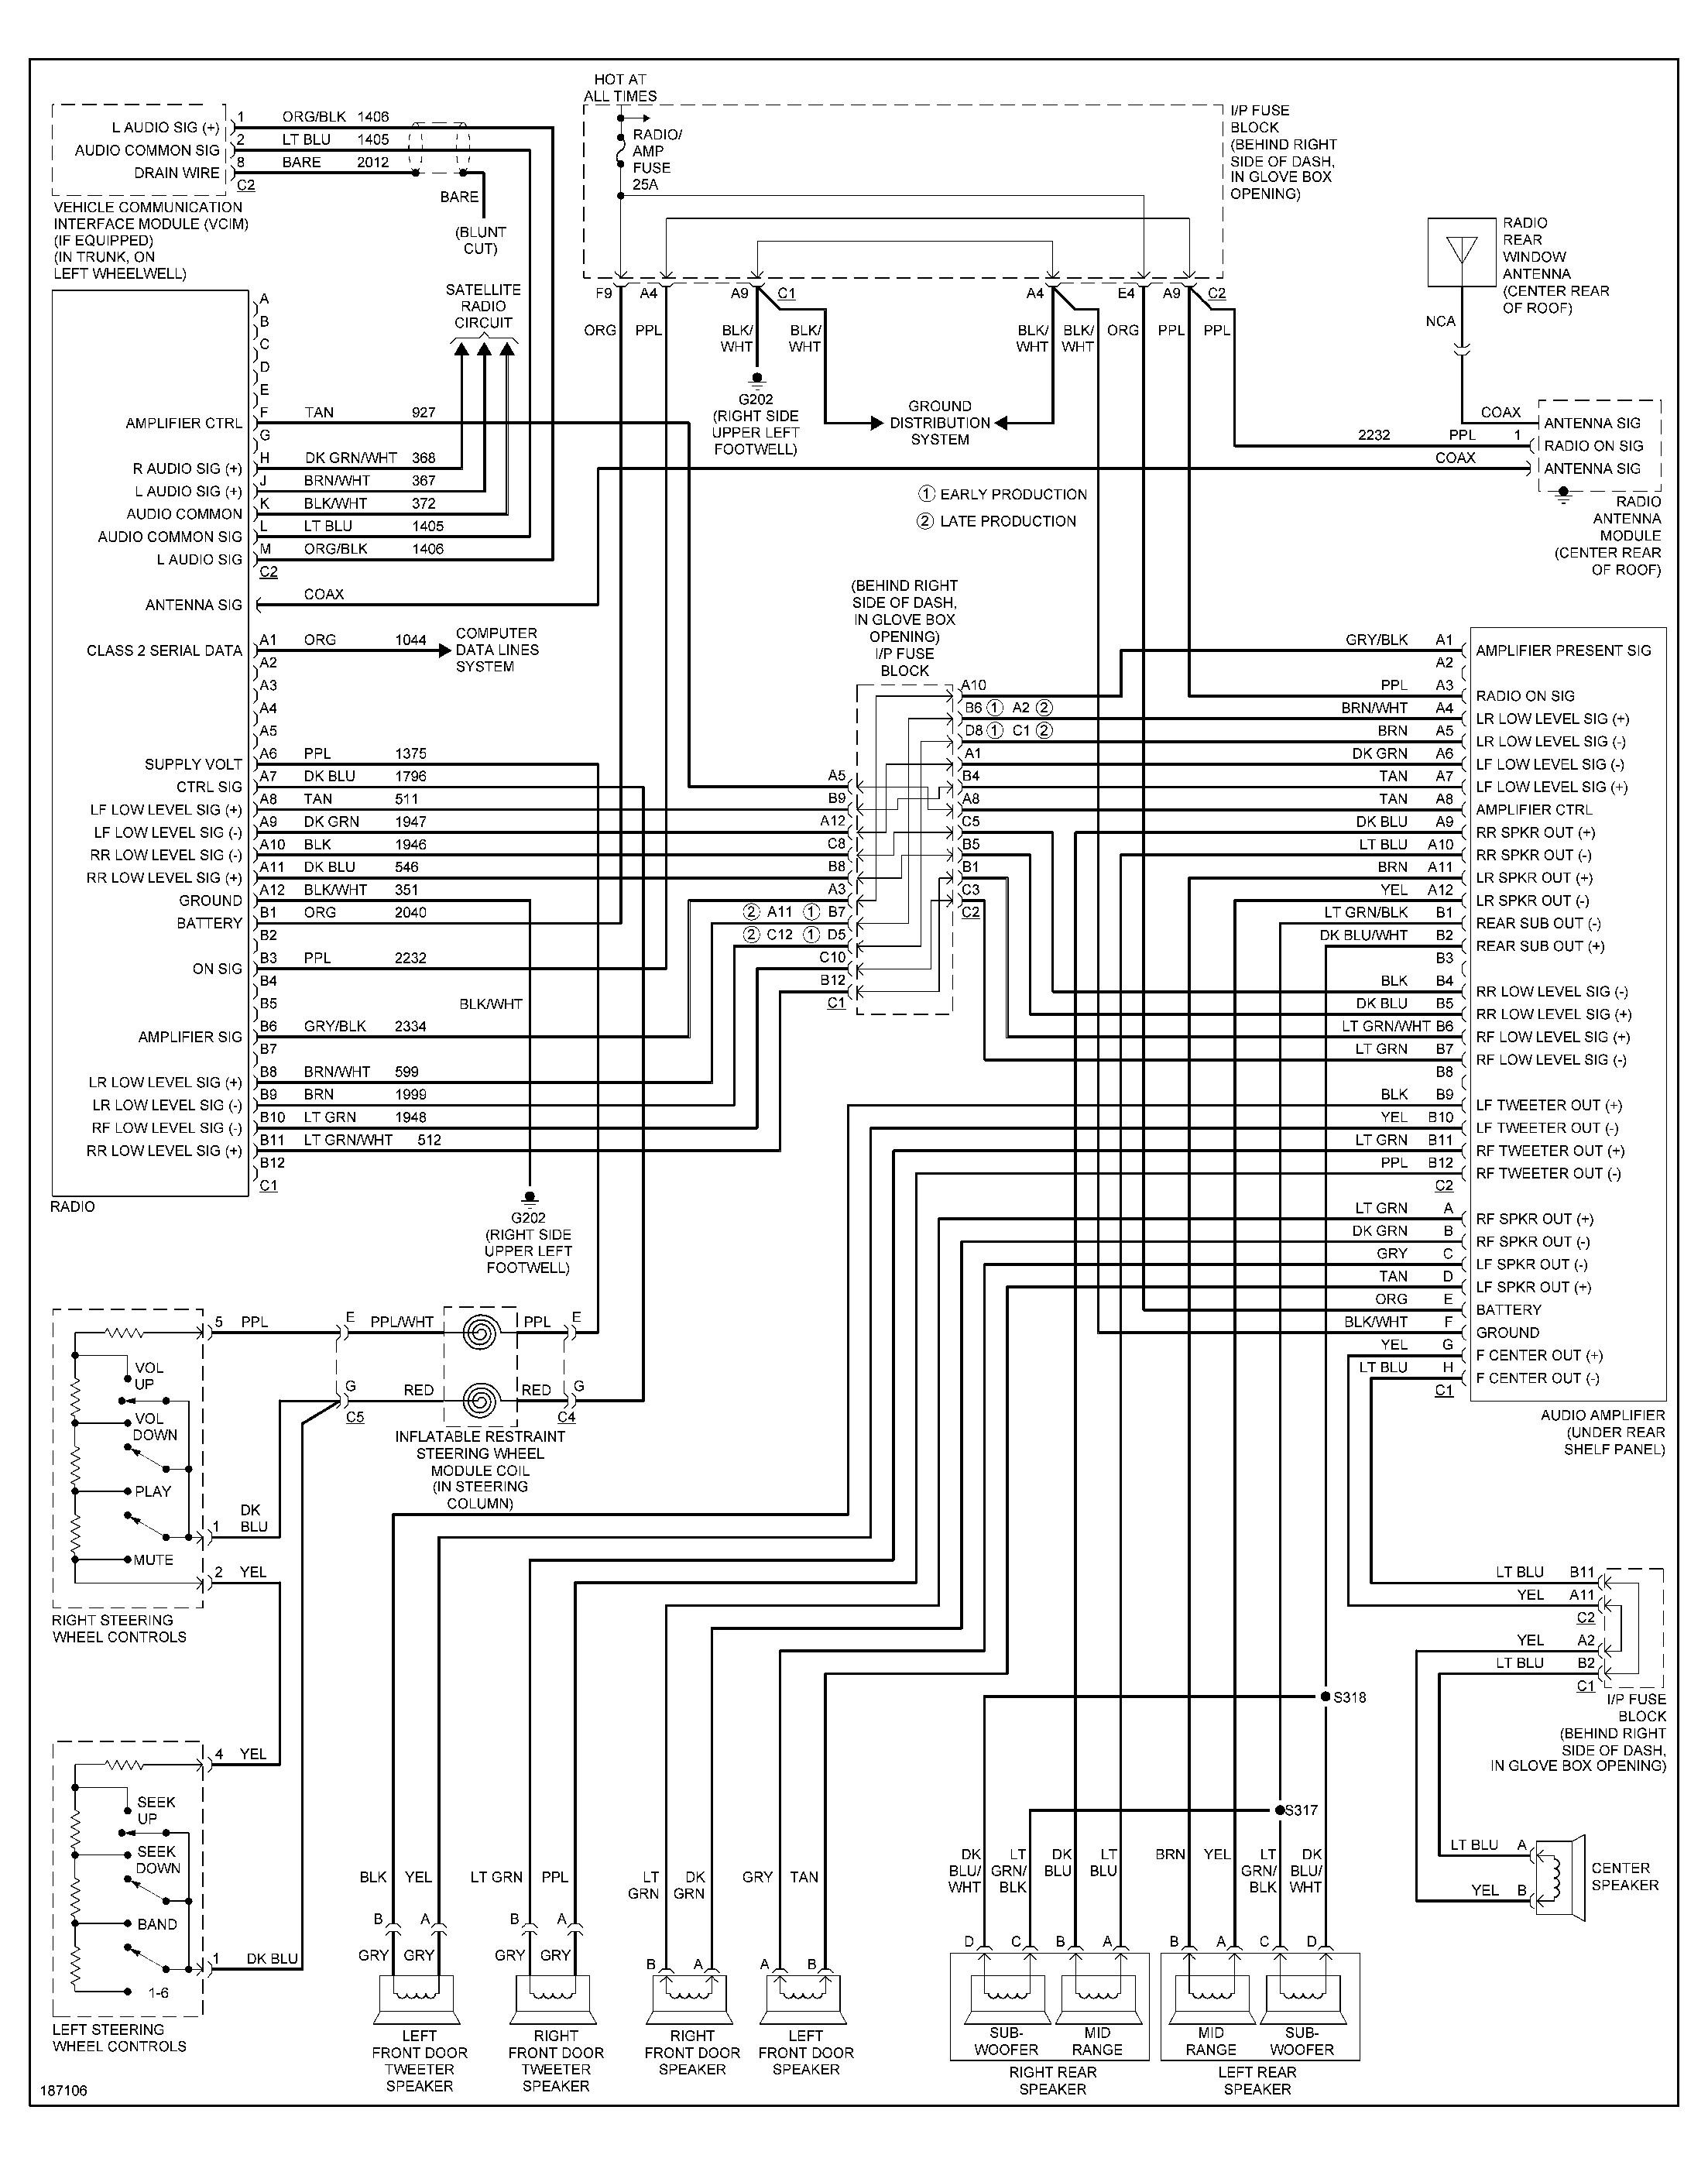 40054 pontiac aztek radio wiring diagram | wiring resources pontiac car radio wiring diagram  wiring resources